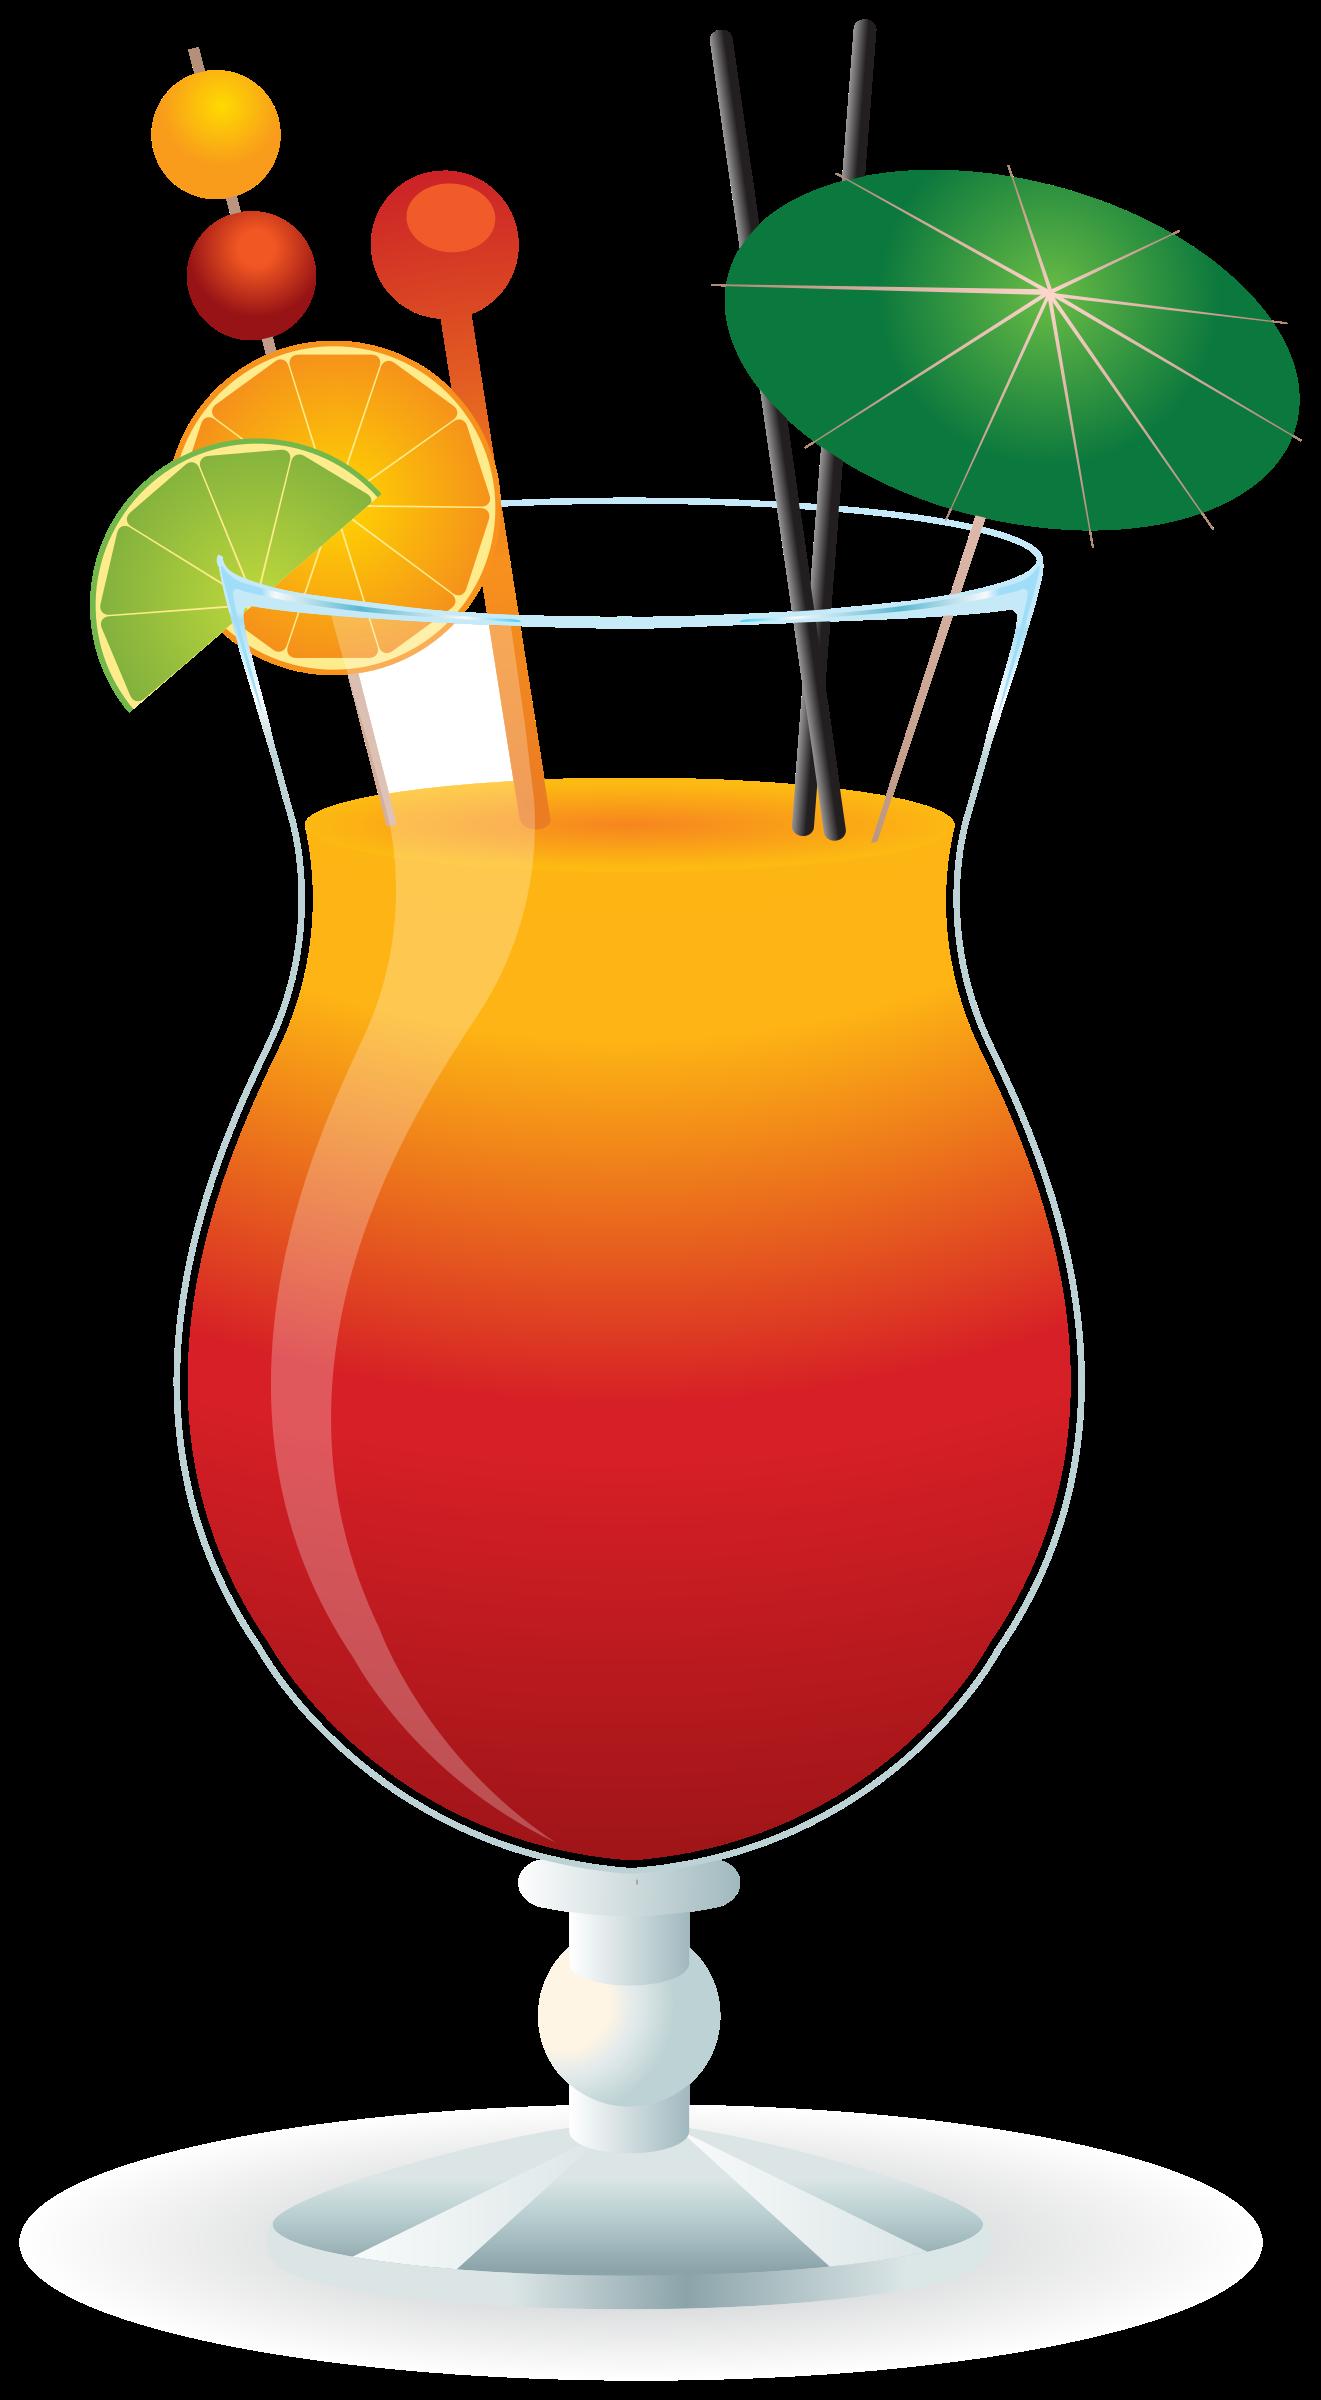 Apple spice mixed drink clipart png transparent Cocktail glass by floEdelmann | cc0 | Pinterest | Cocktail glass and ... png transparent